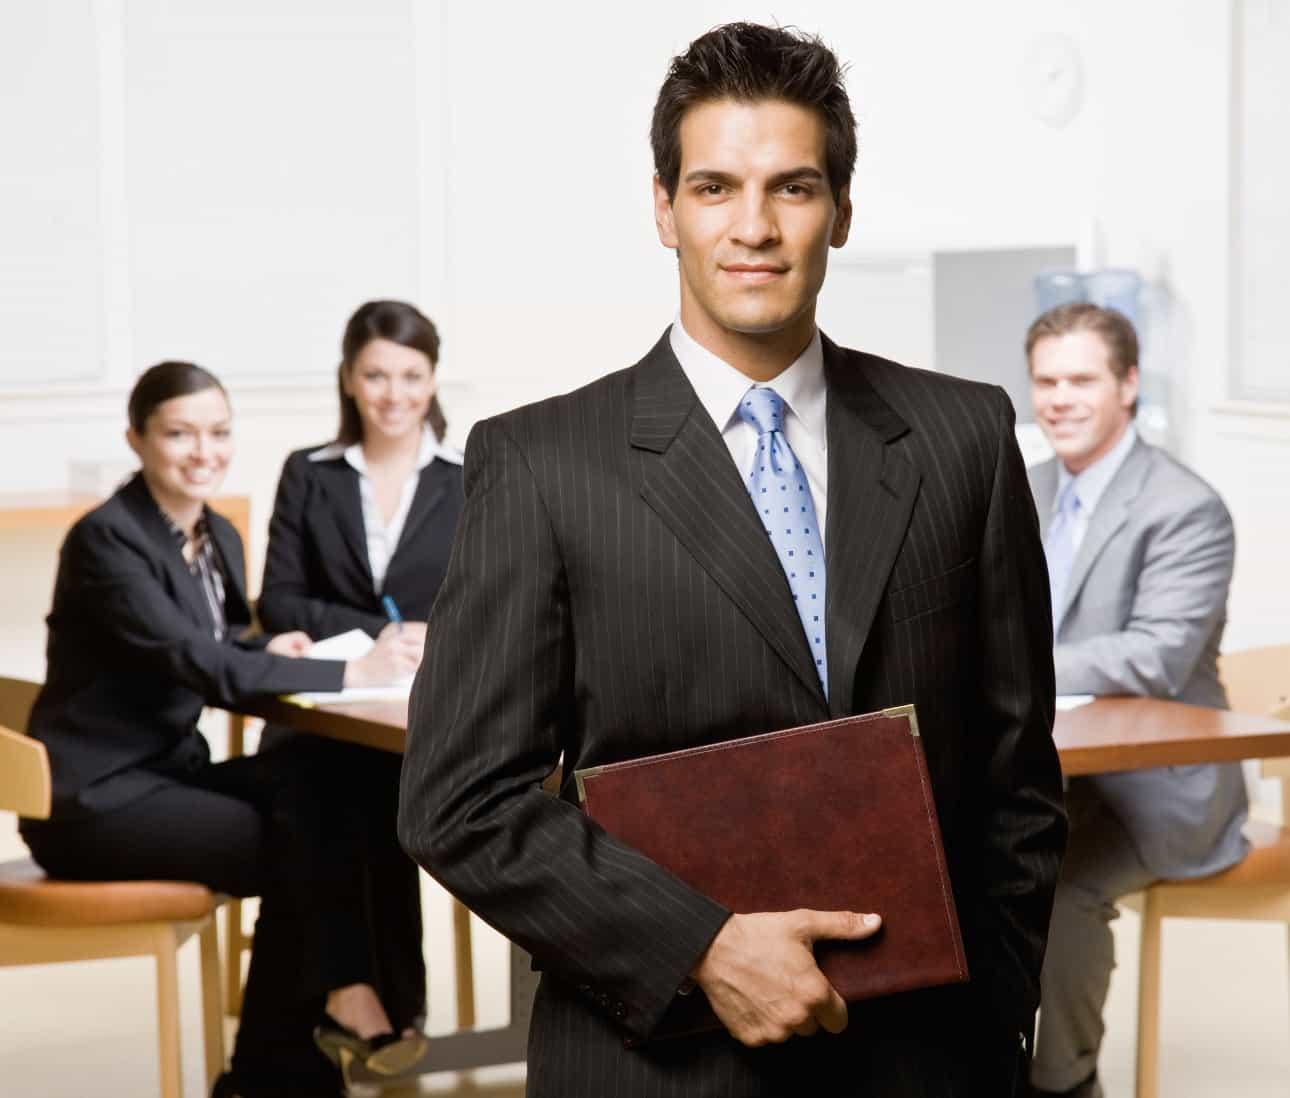 Candidates & Employees